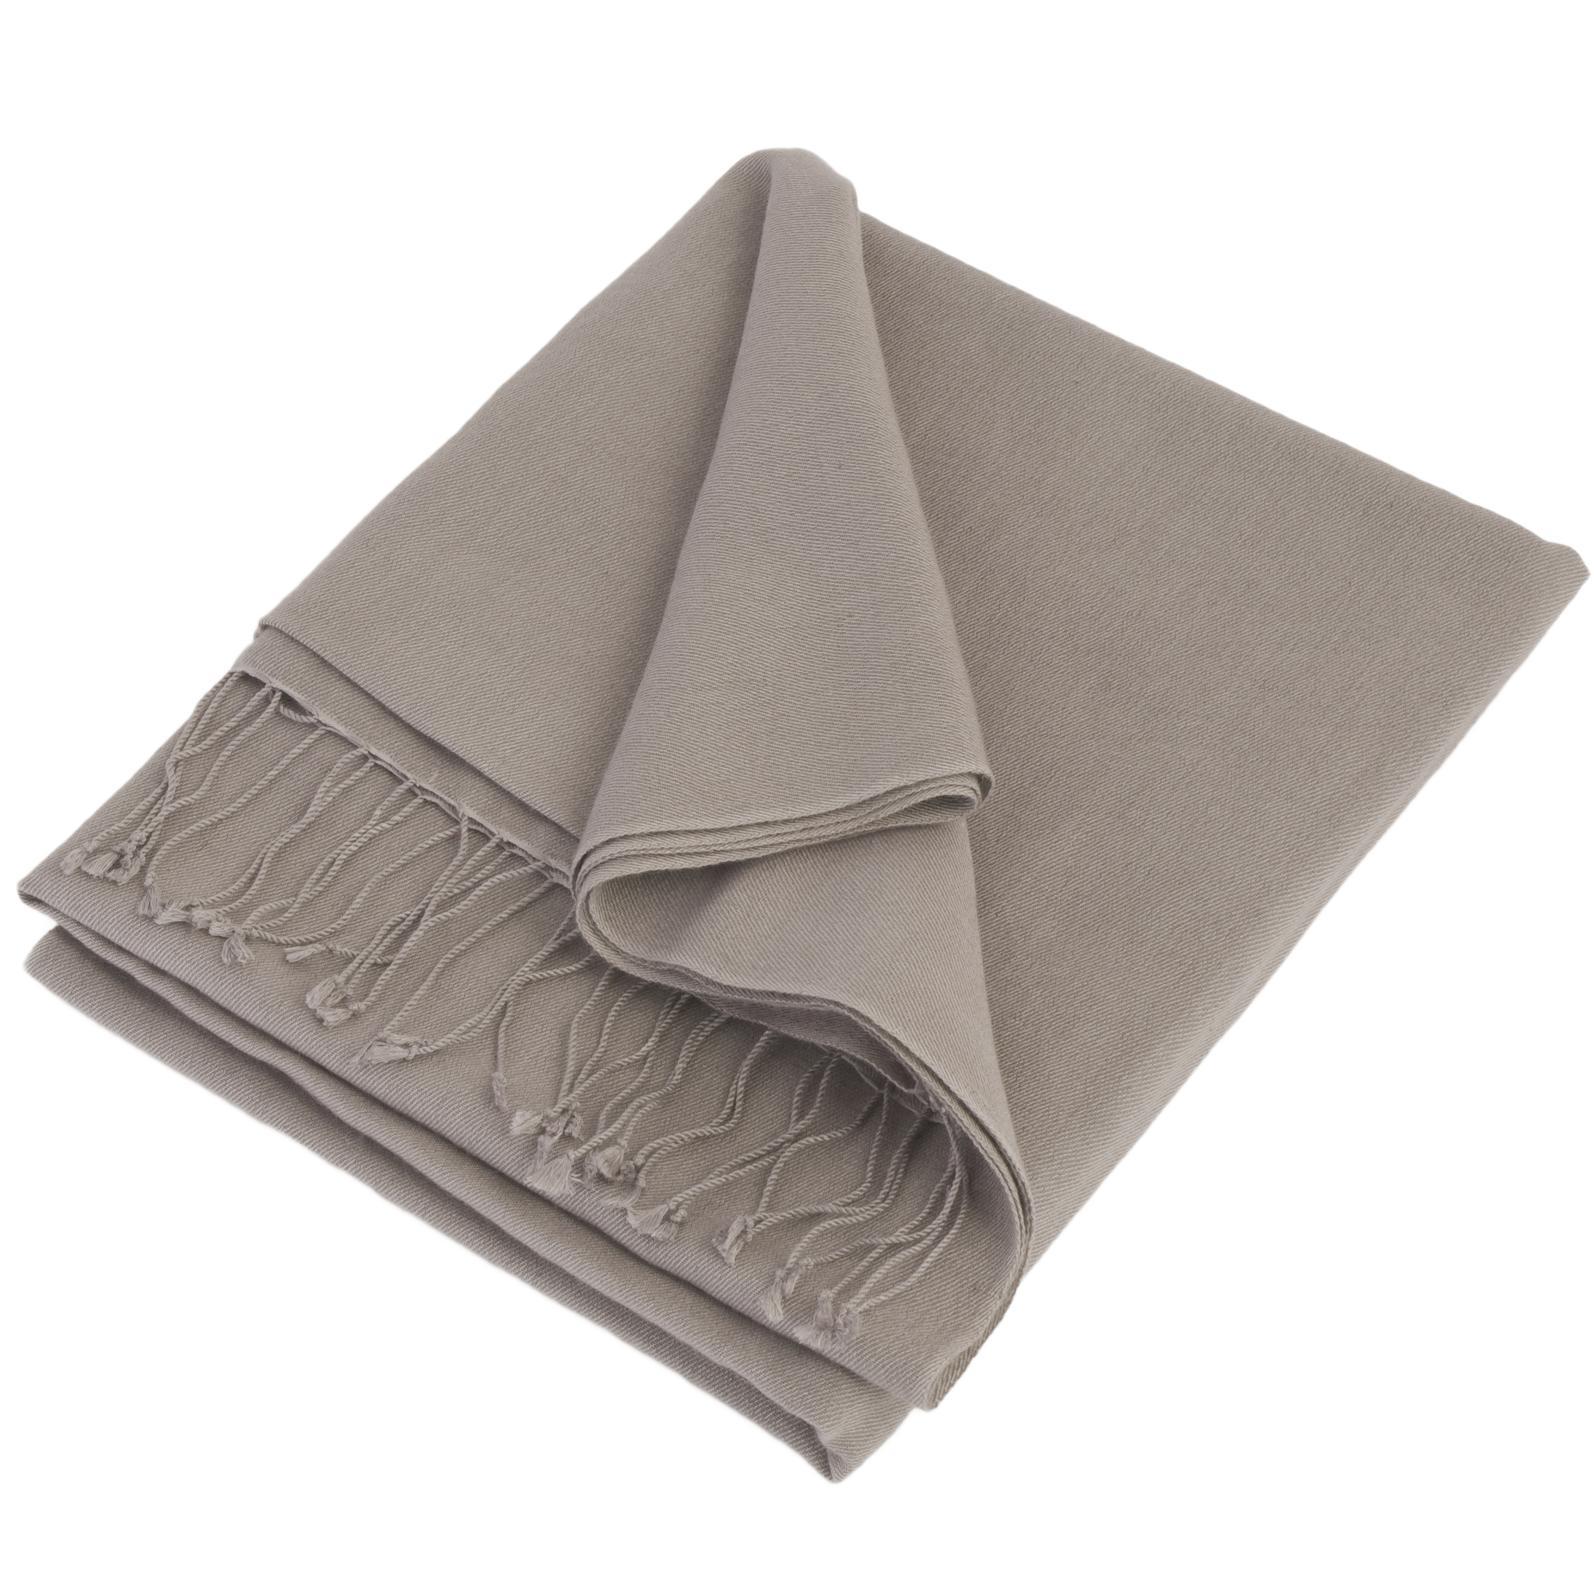 Pashmina Stole - 70x200cm - 100% Cashmere - Steeple Grey